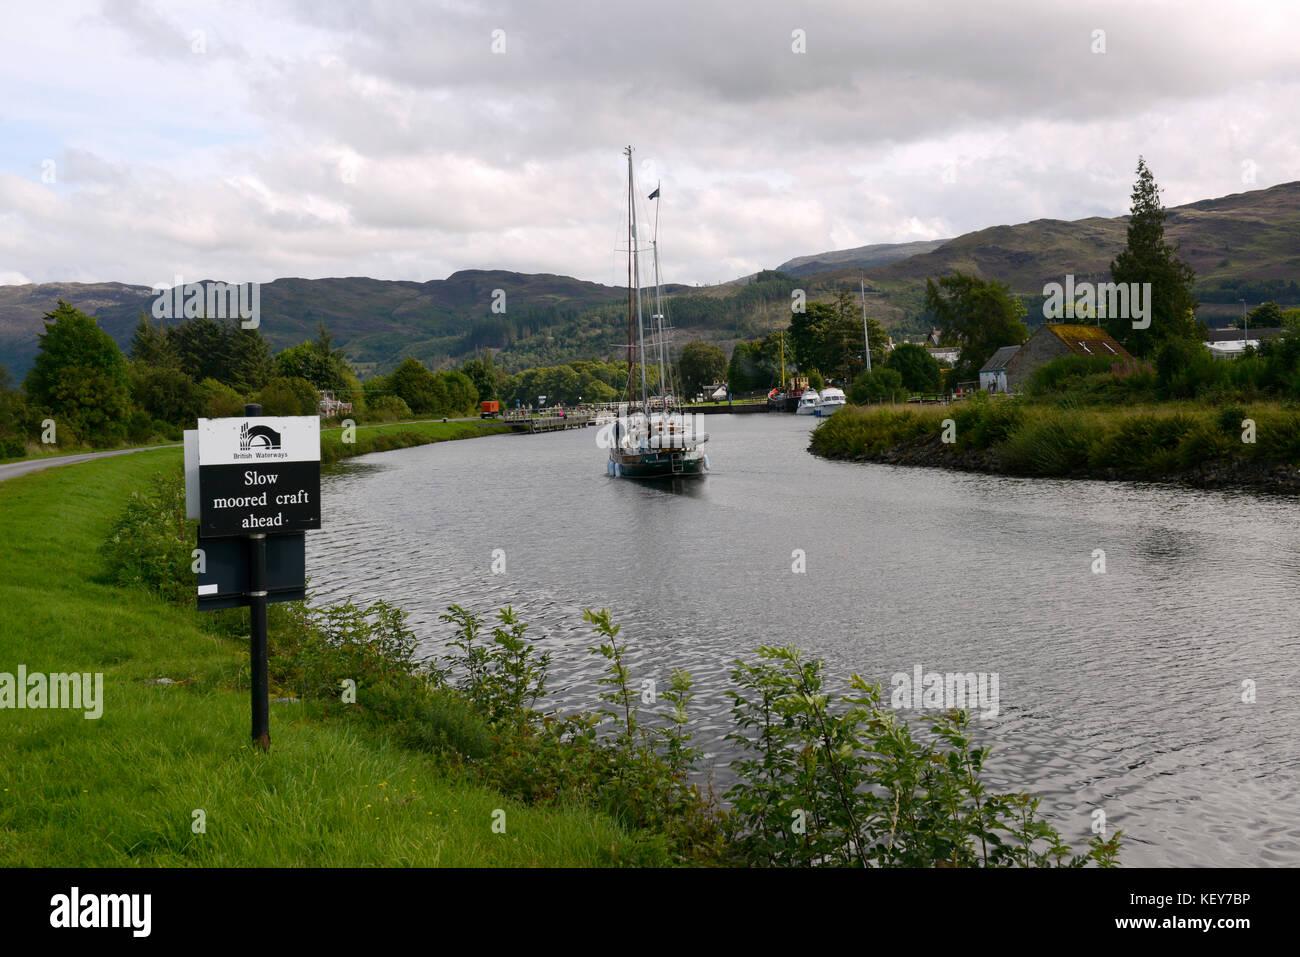 Scotland, UK.  Yacht named Spirit of Worcester cruising on Caledonian Canal near Loch Ness. - Stock Image